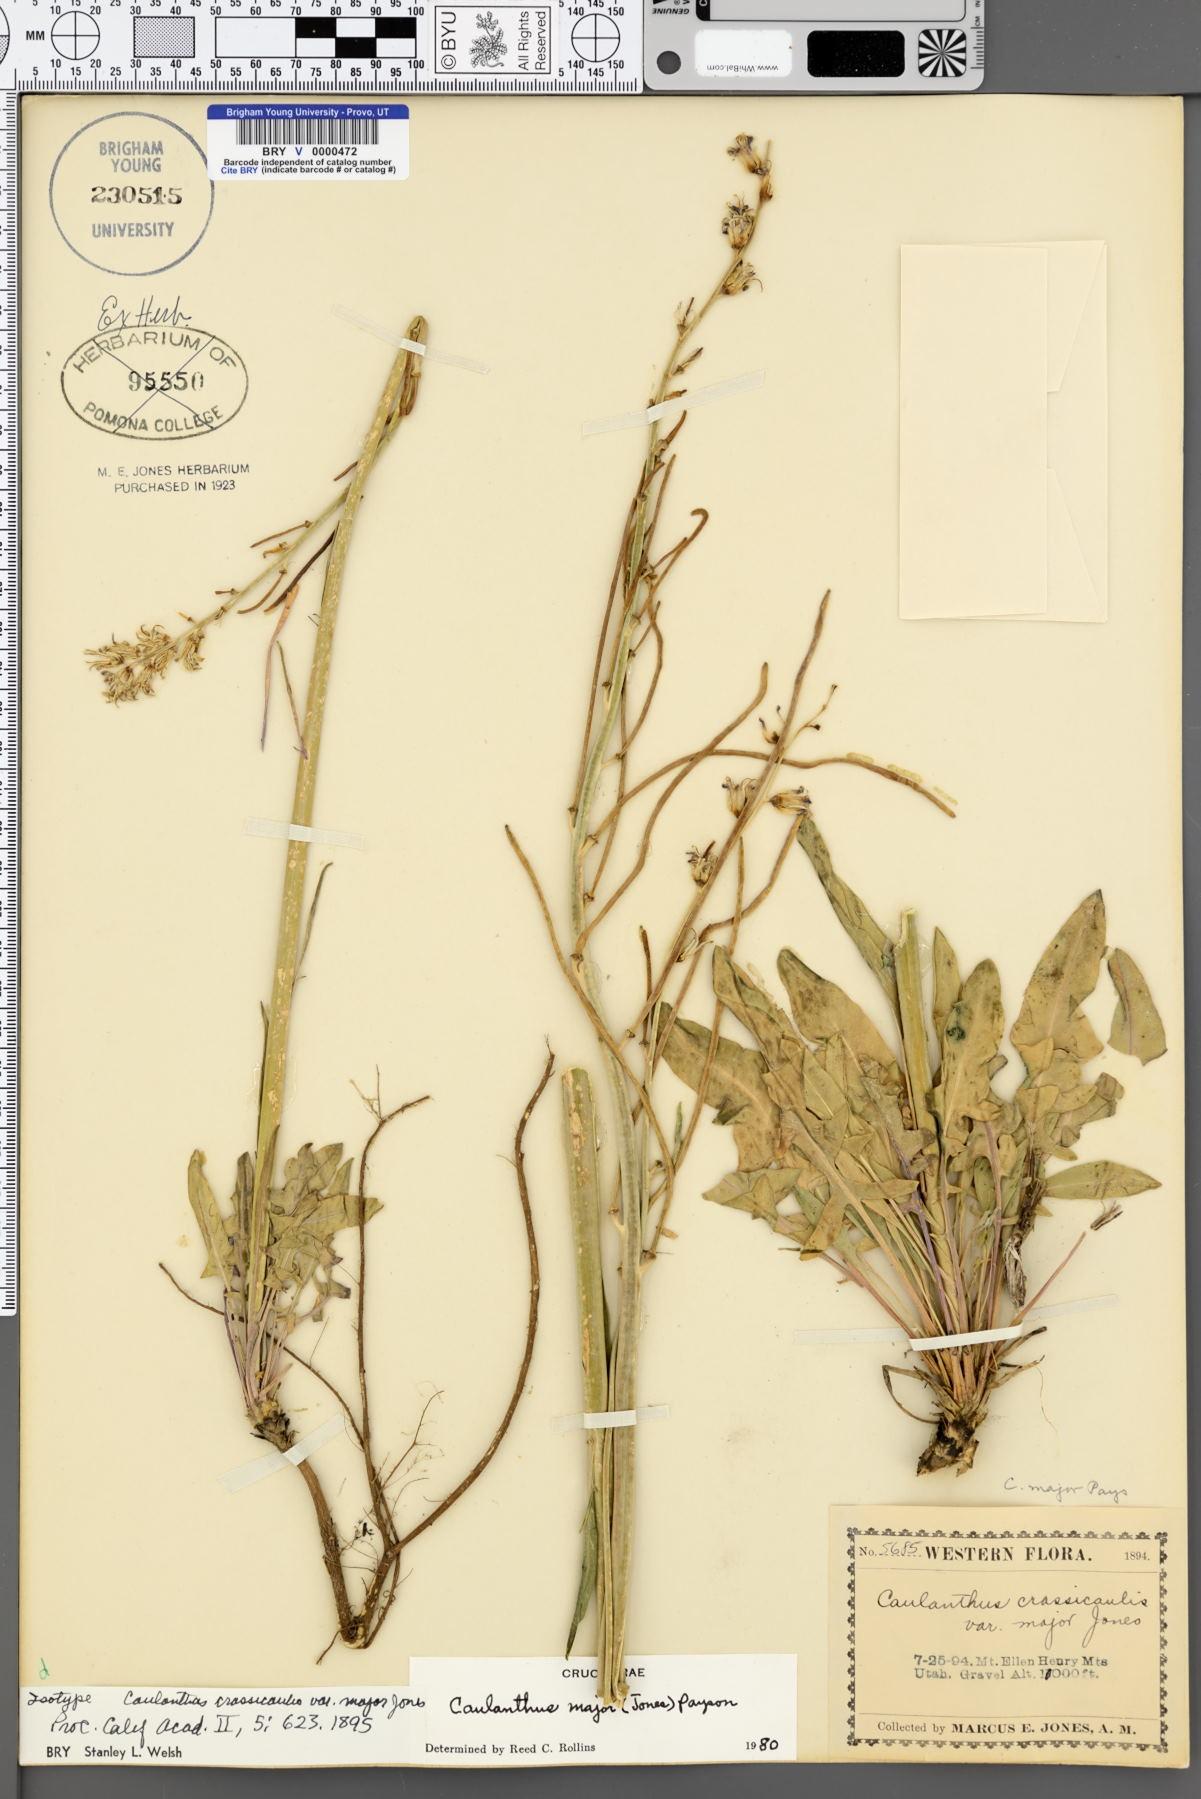 Caulanthus crassicaulis var. major image